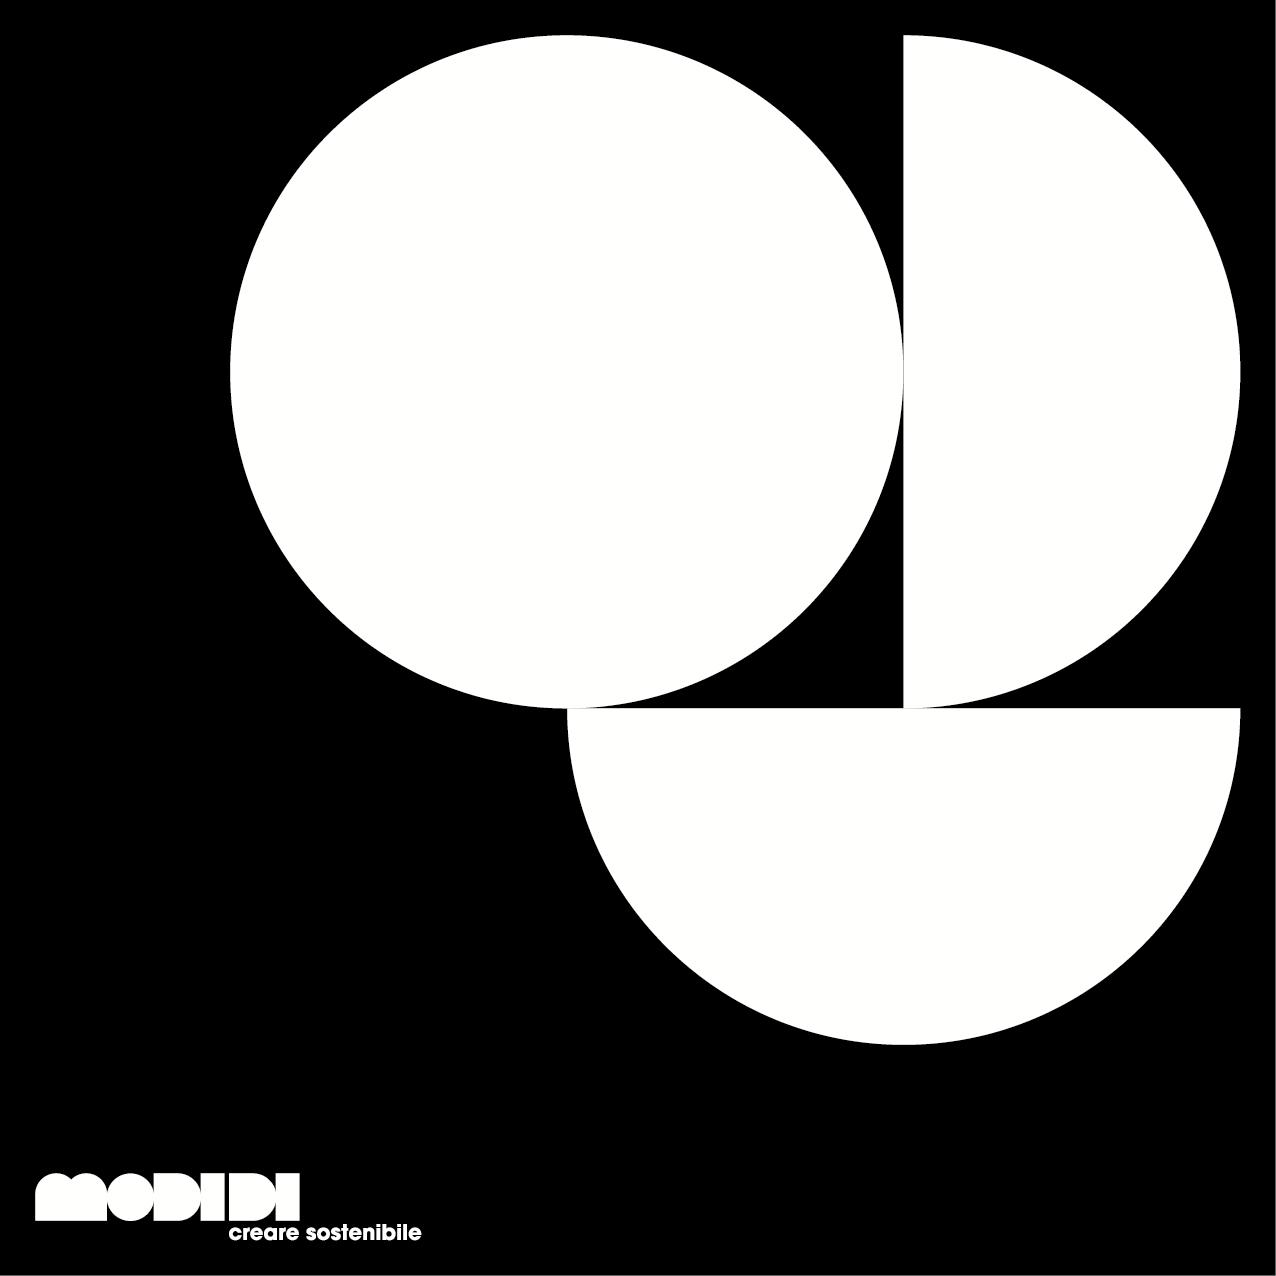 Modidi-Blulab-001